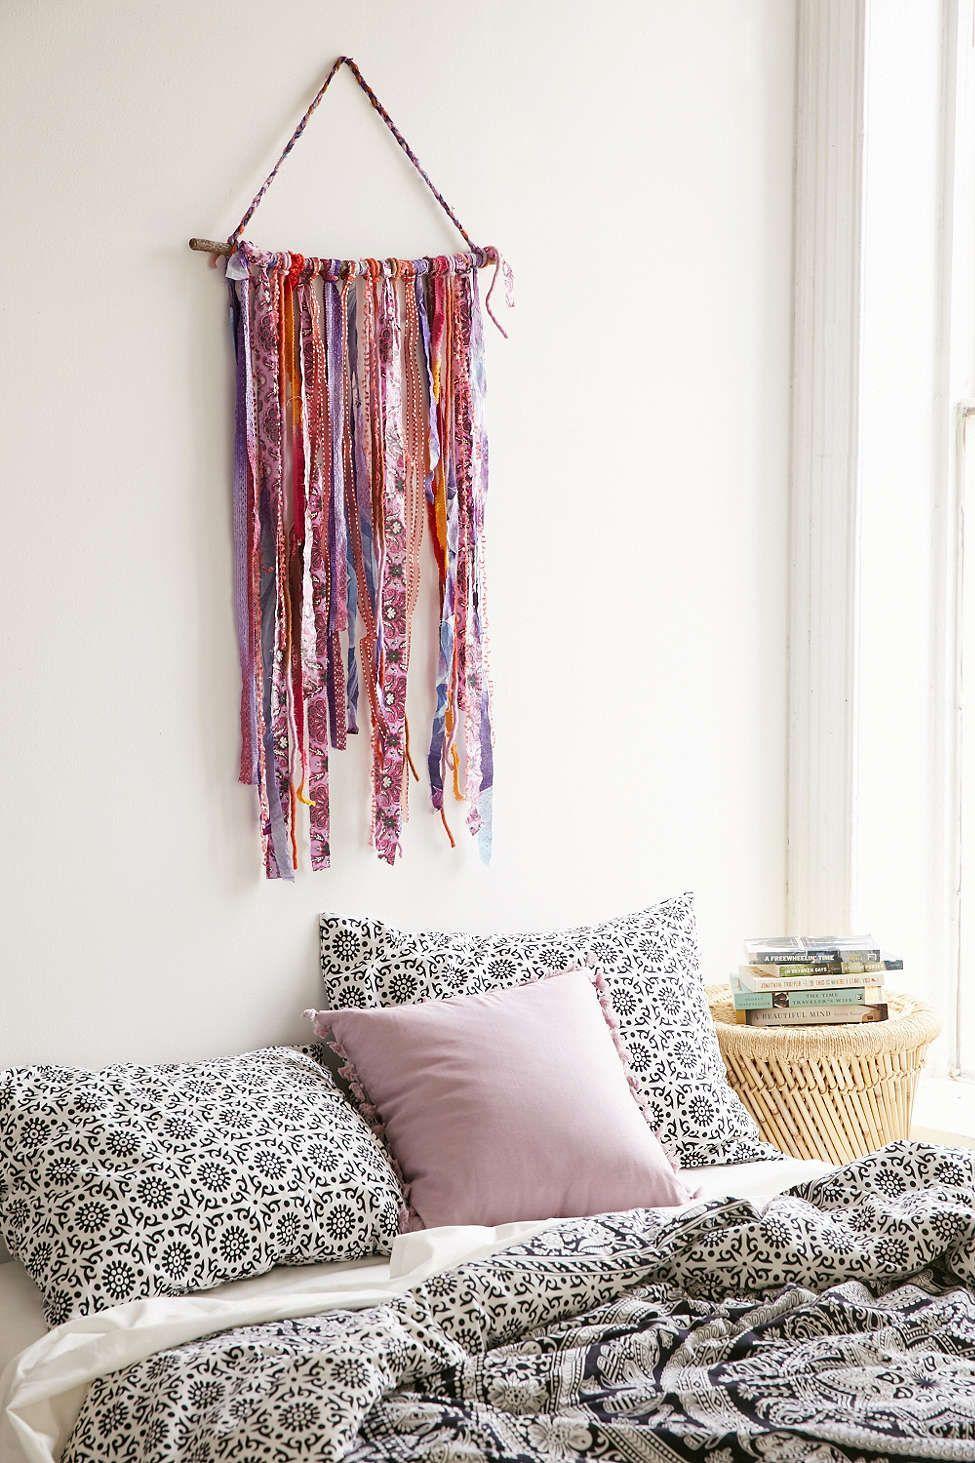 Magical Thinking Quetzal Yarn iWalli Hanging iBohoi room